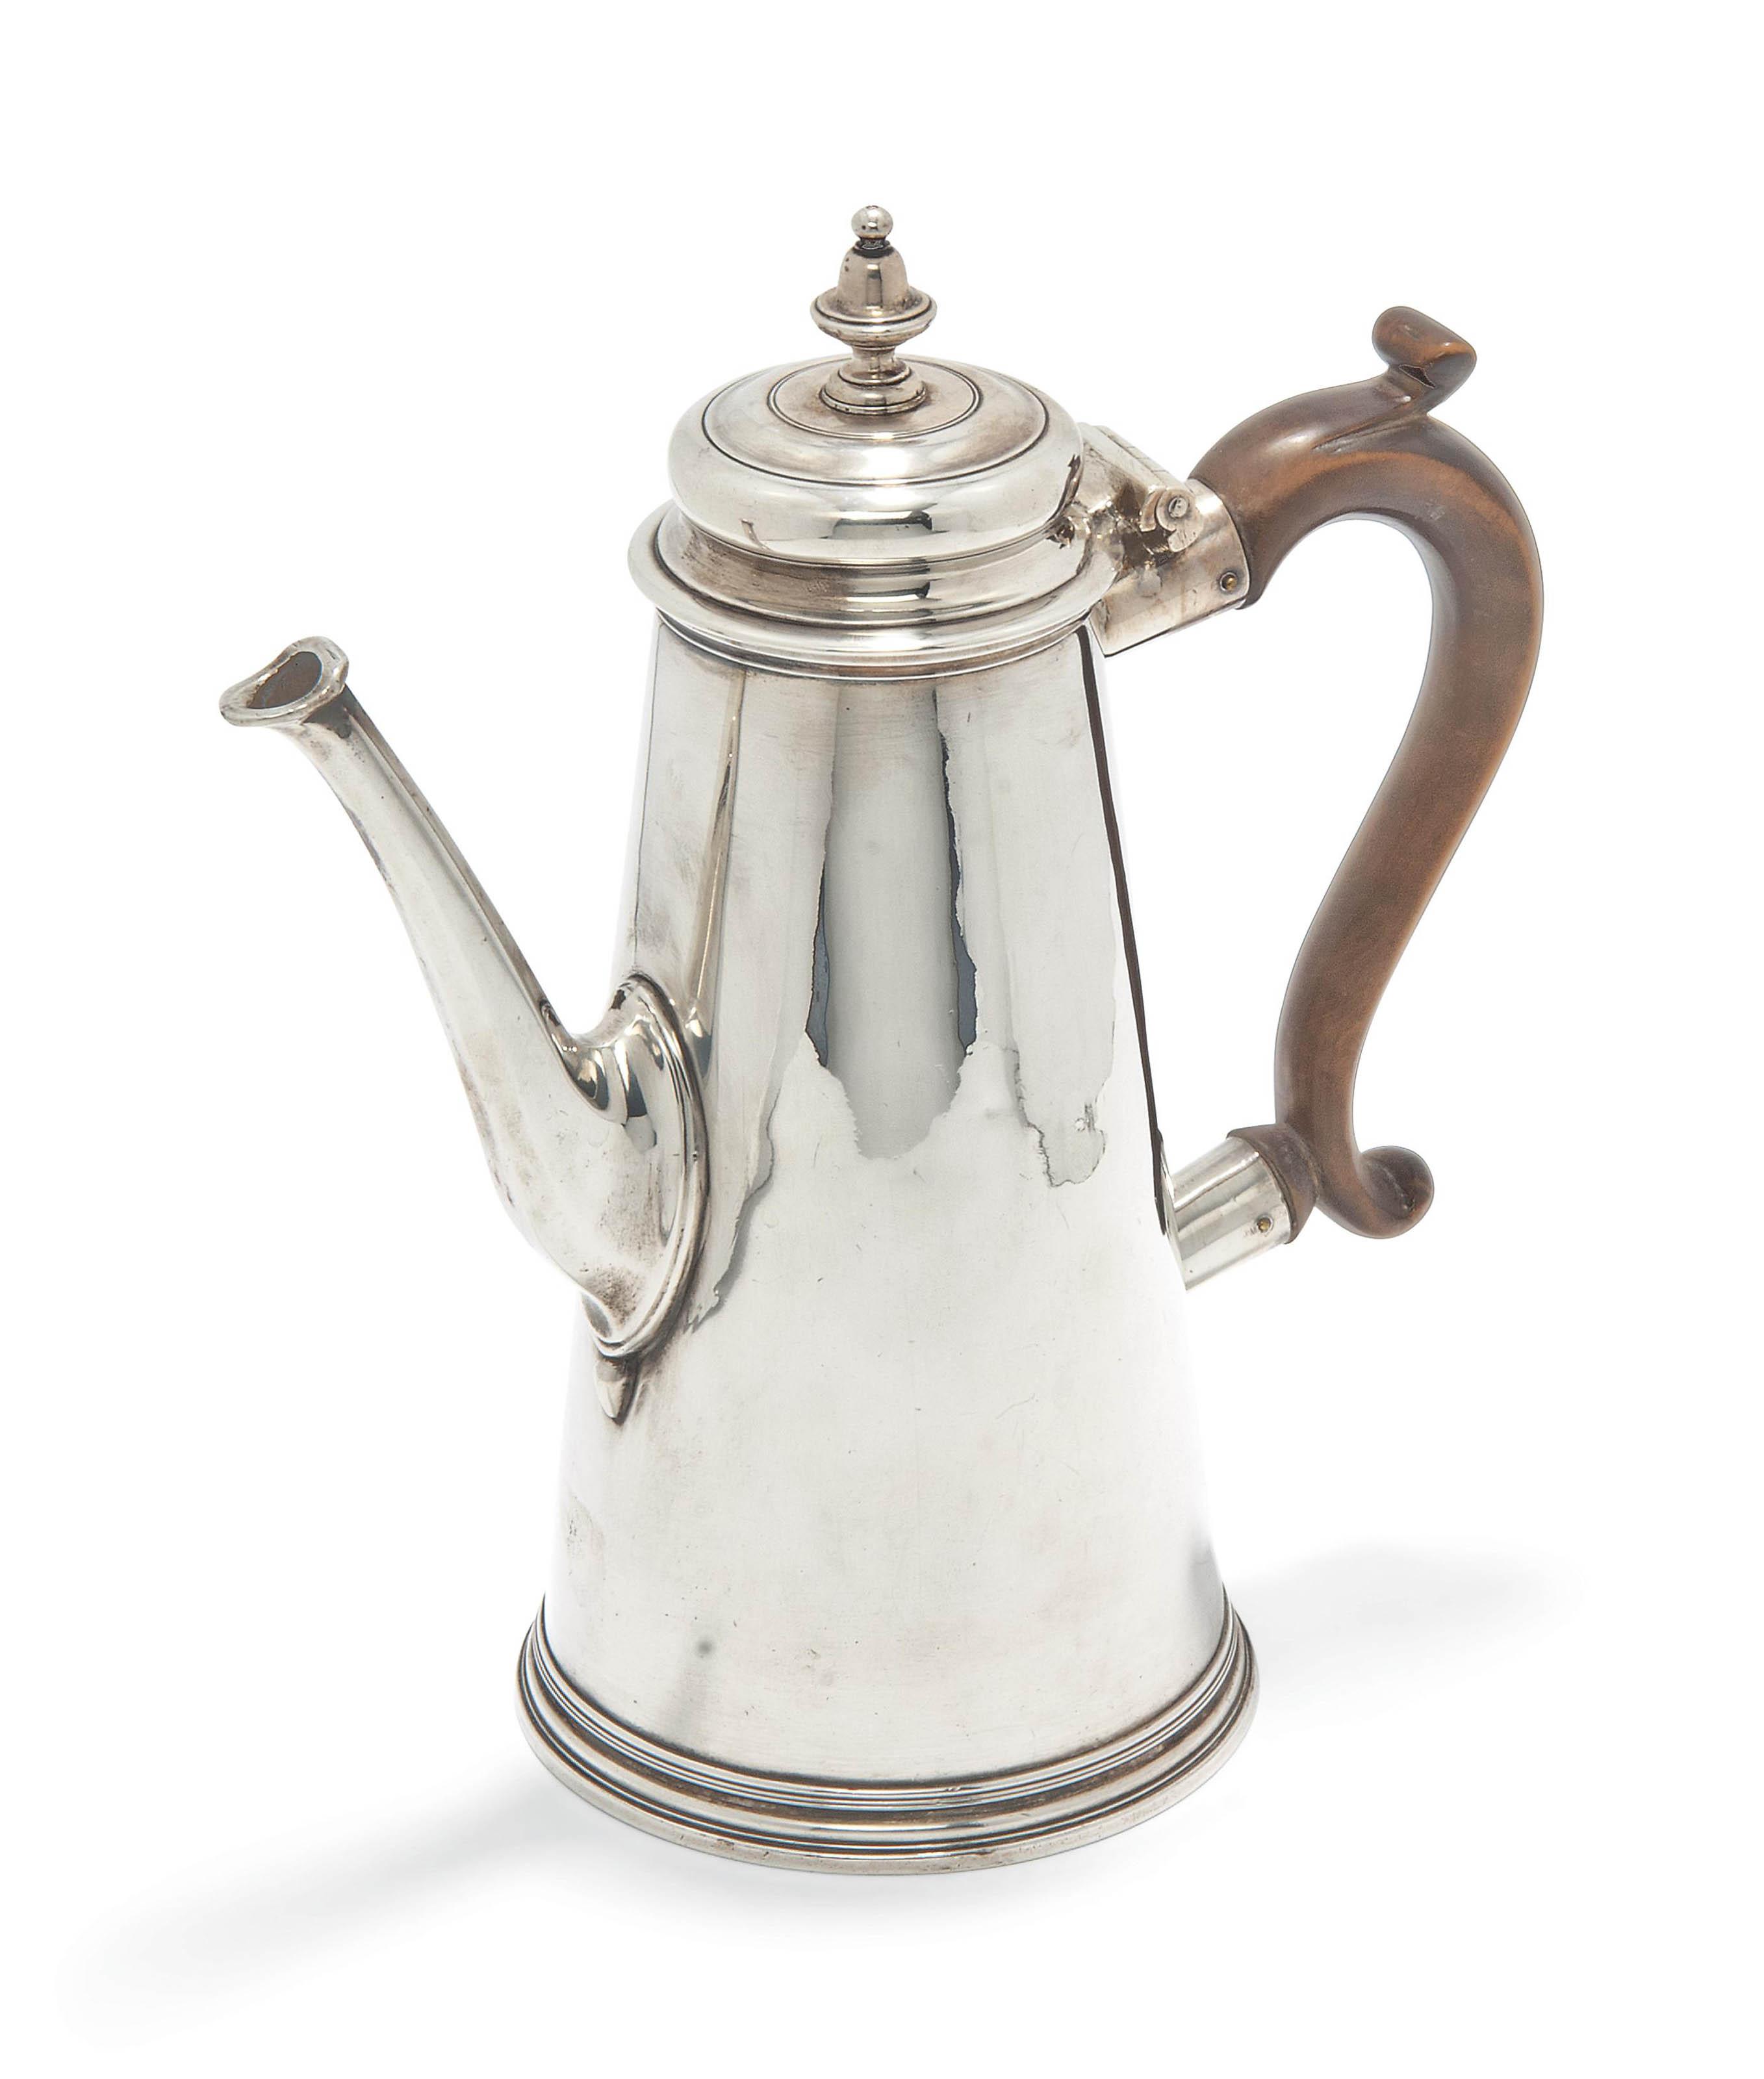 A GEORGE II TAPERING SILVER COFFEE POT